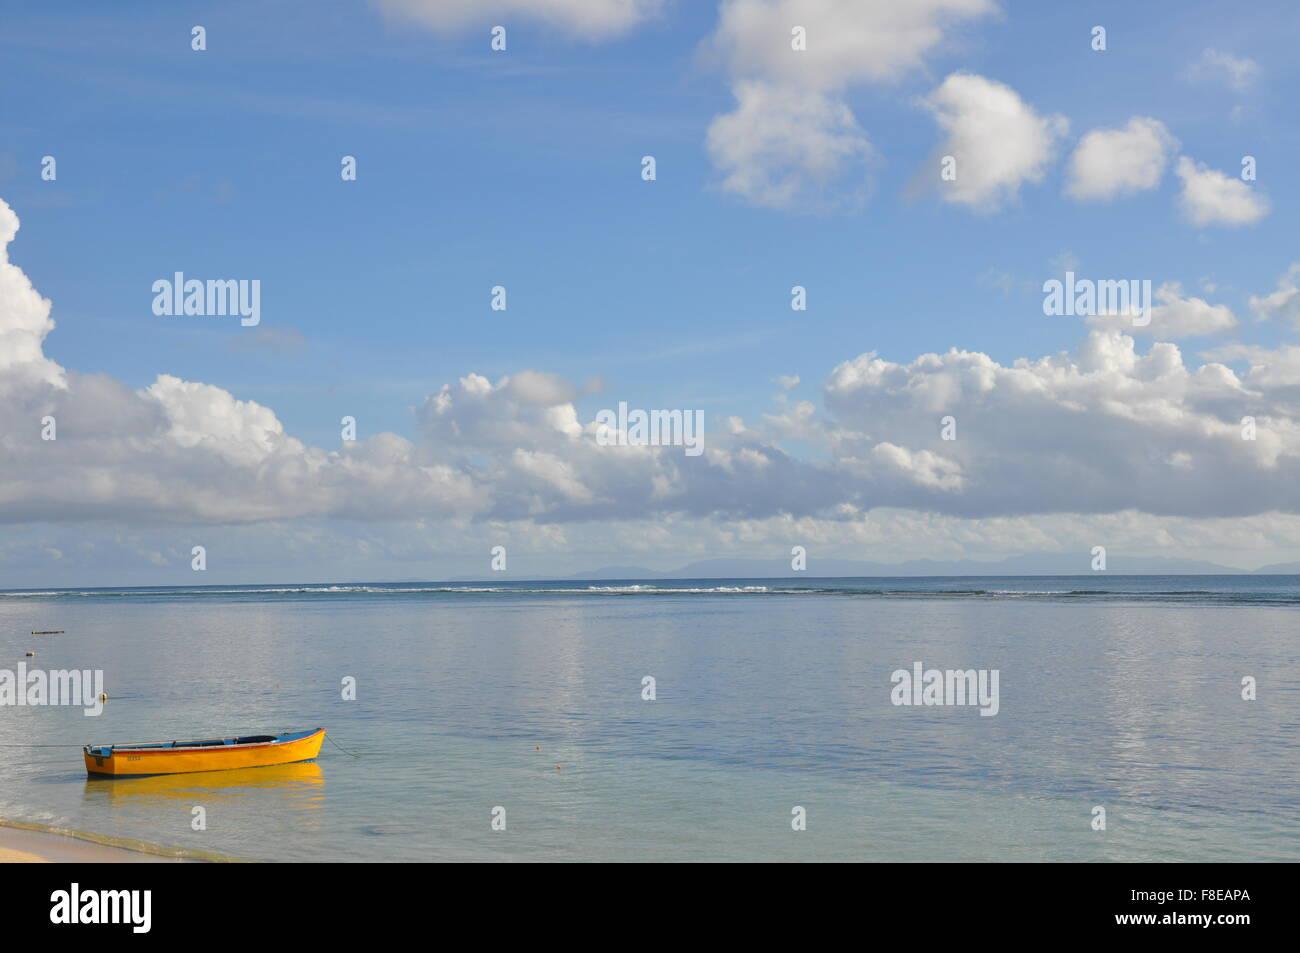 A small dinghy on a tropical beach, seychelles - Stock Image